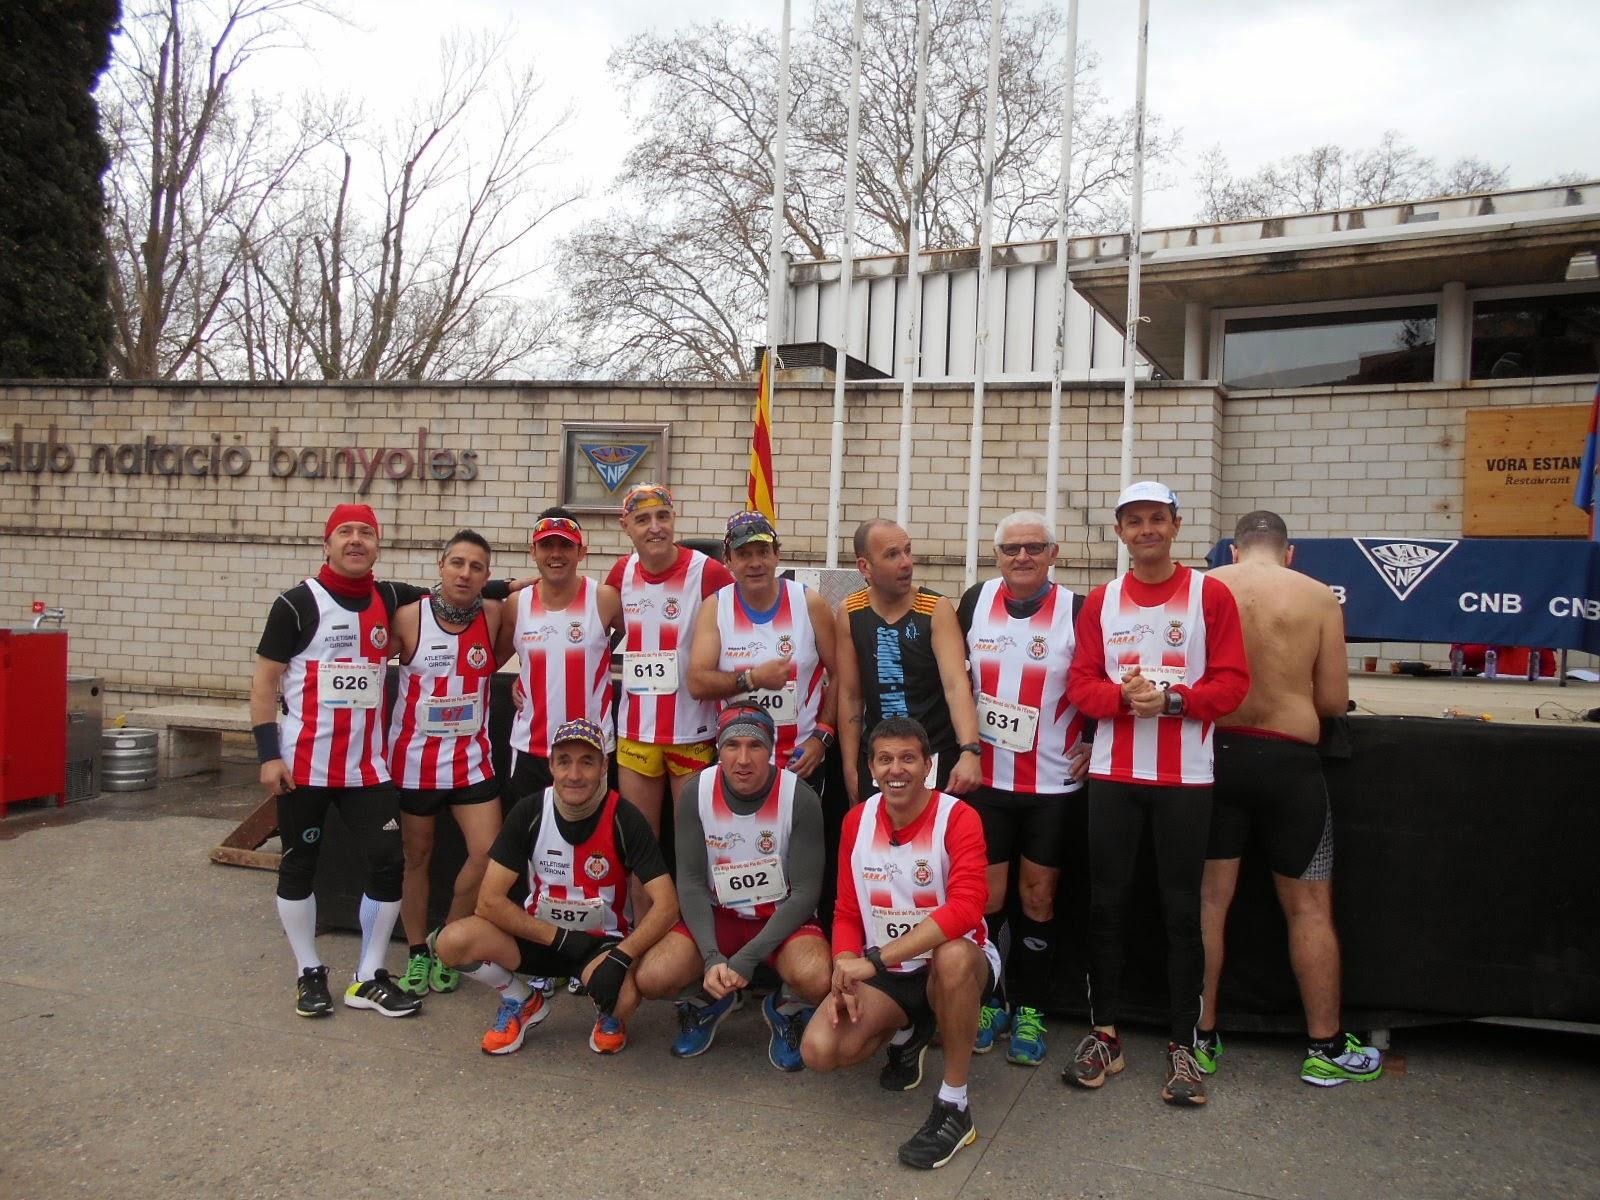 Fotos mitja marato banyoles 97